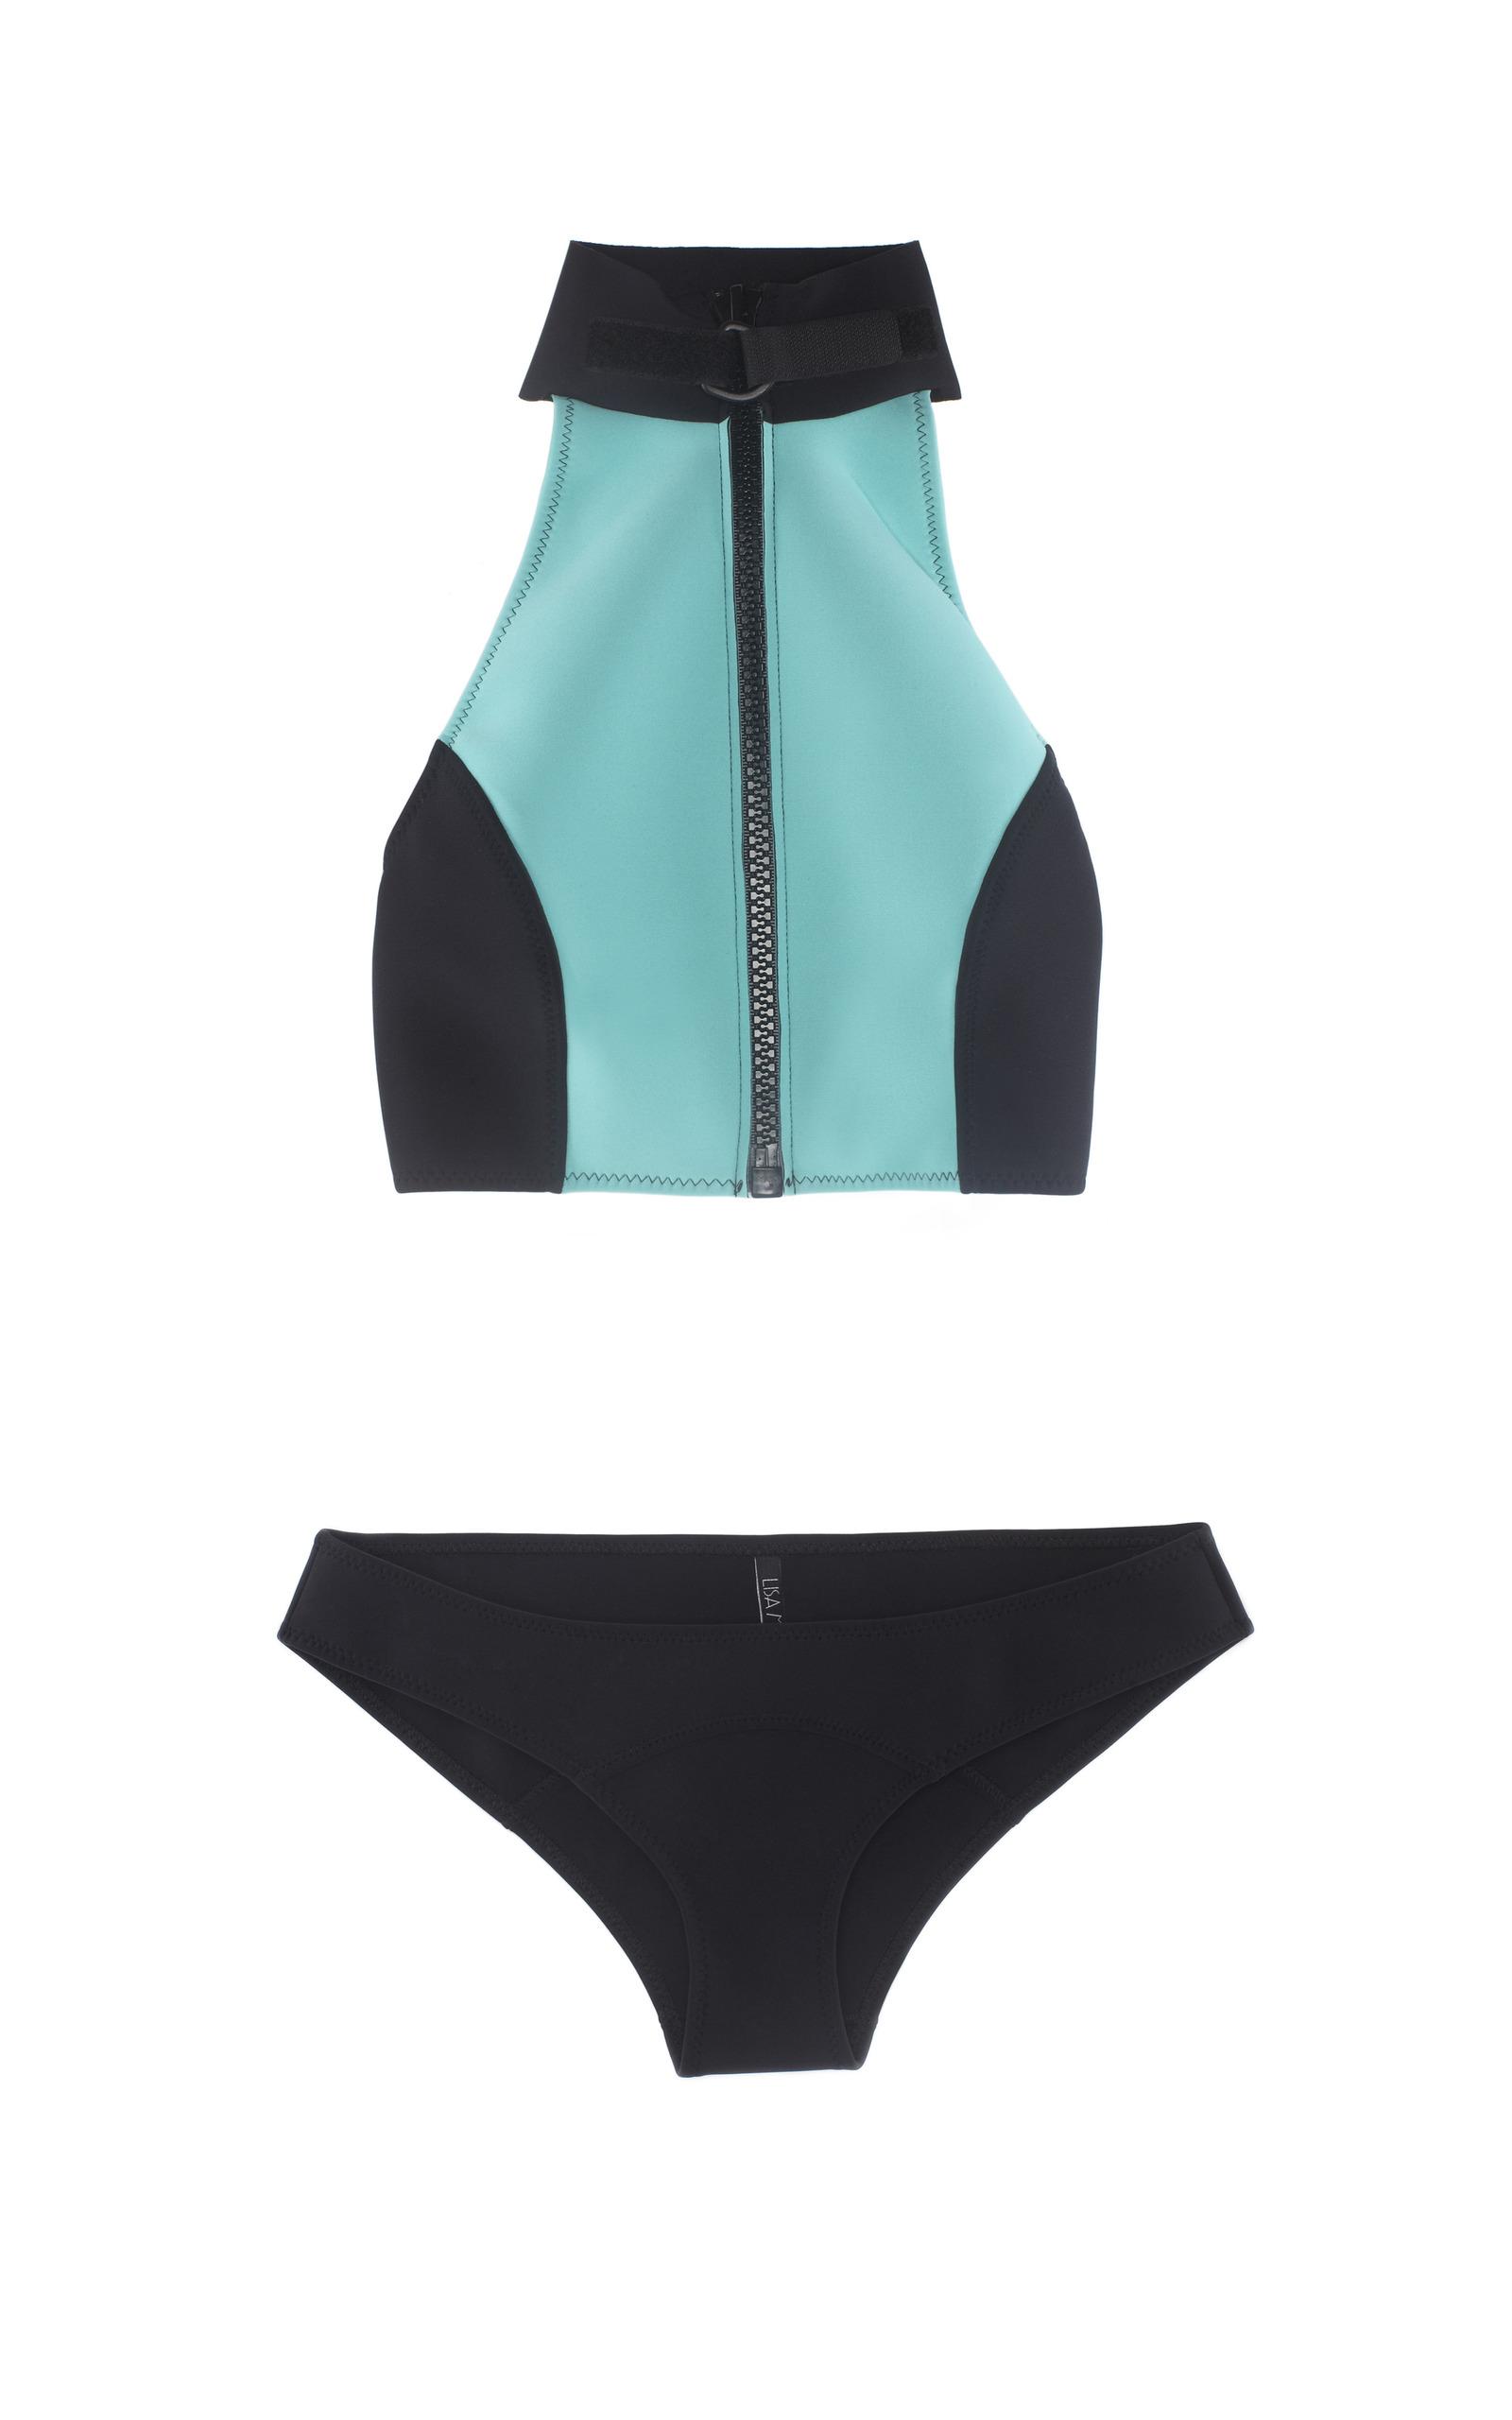 wetsuit-style-bikini-muscle-women-girls-having-sex